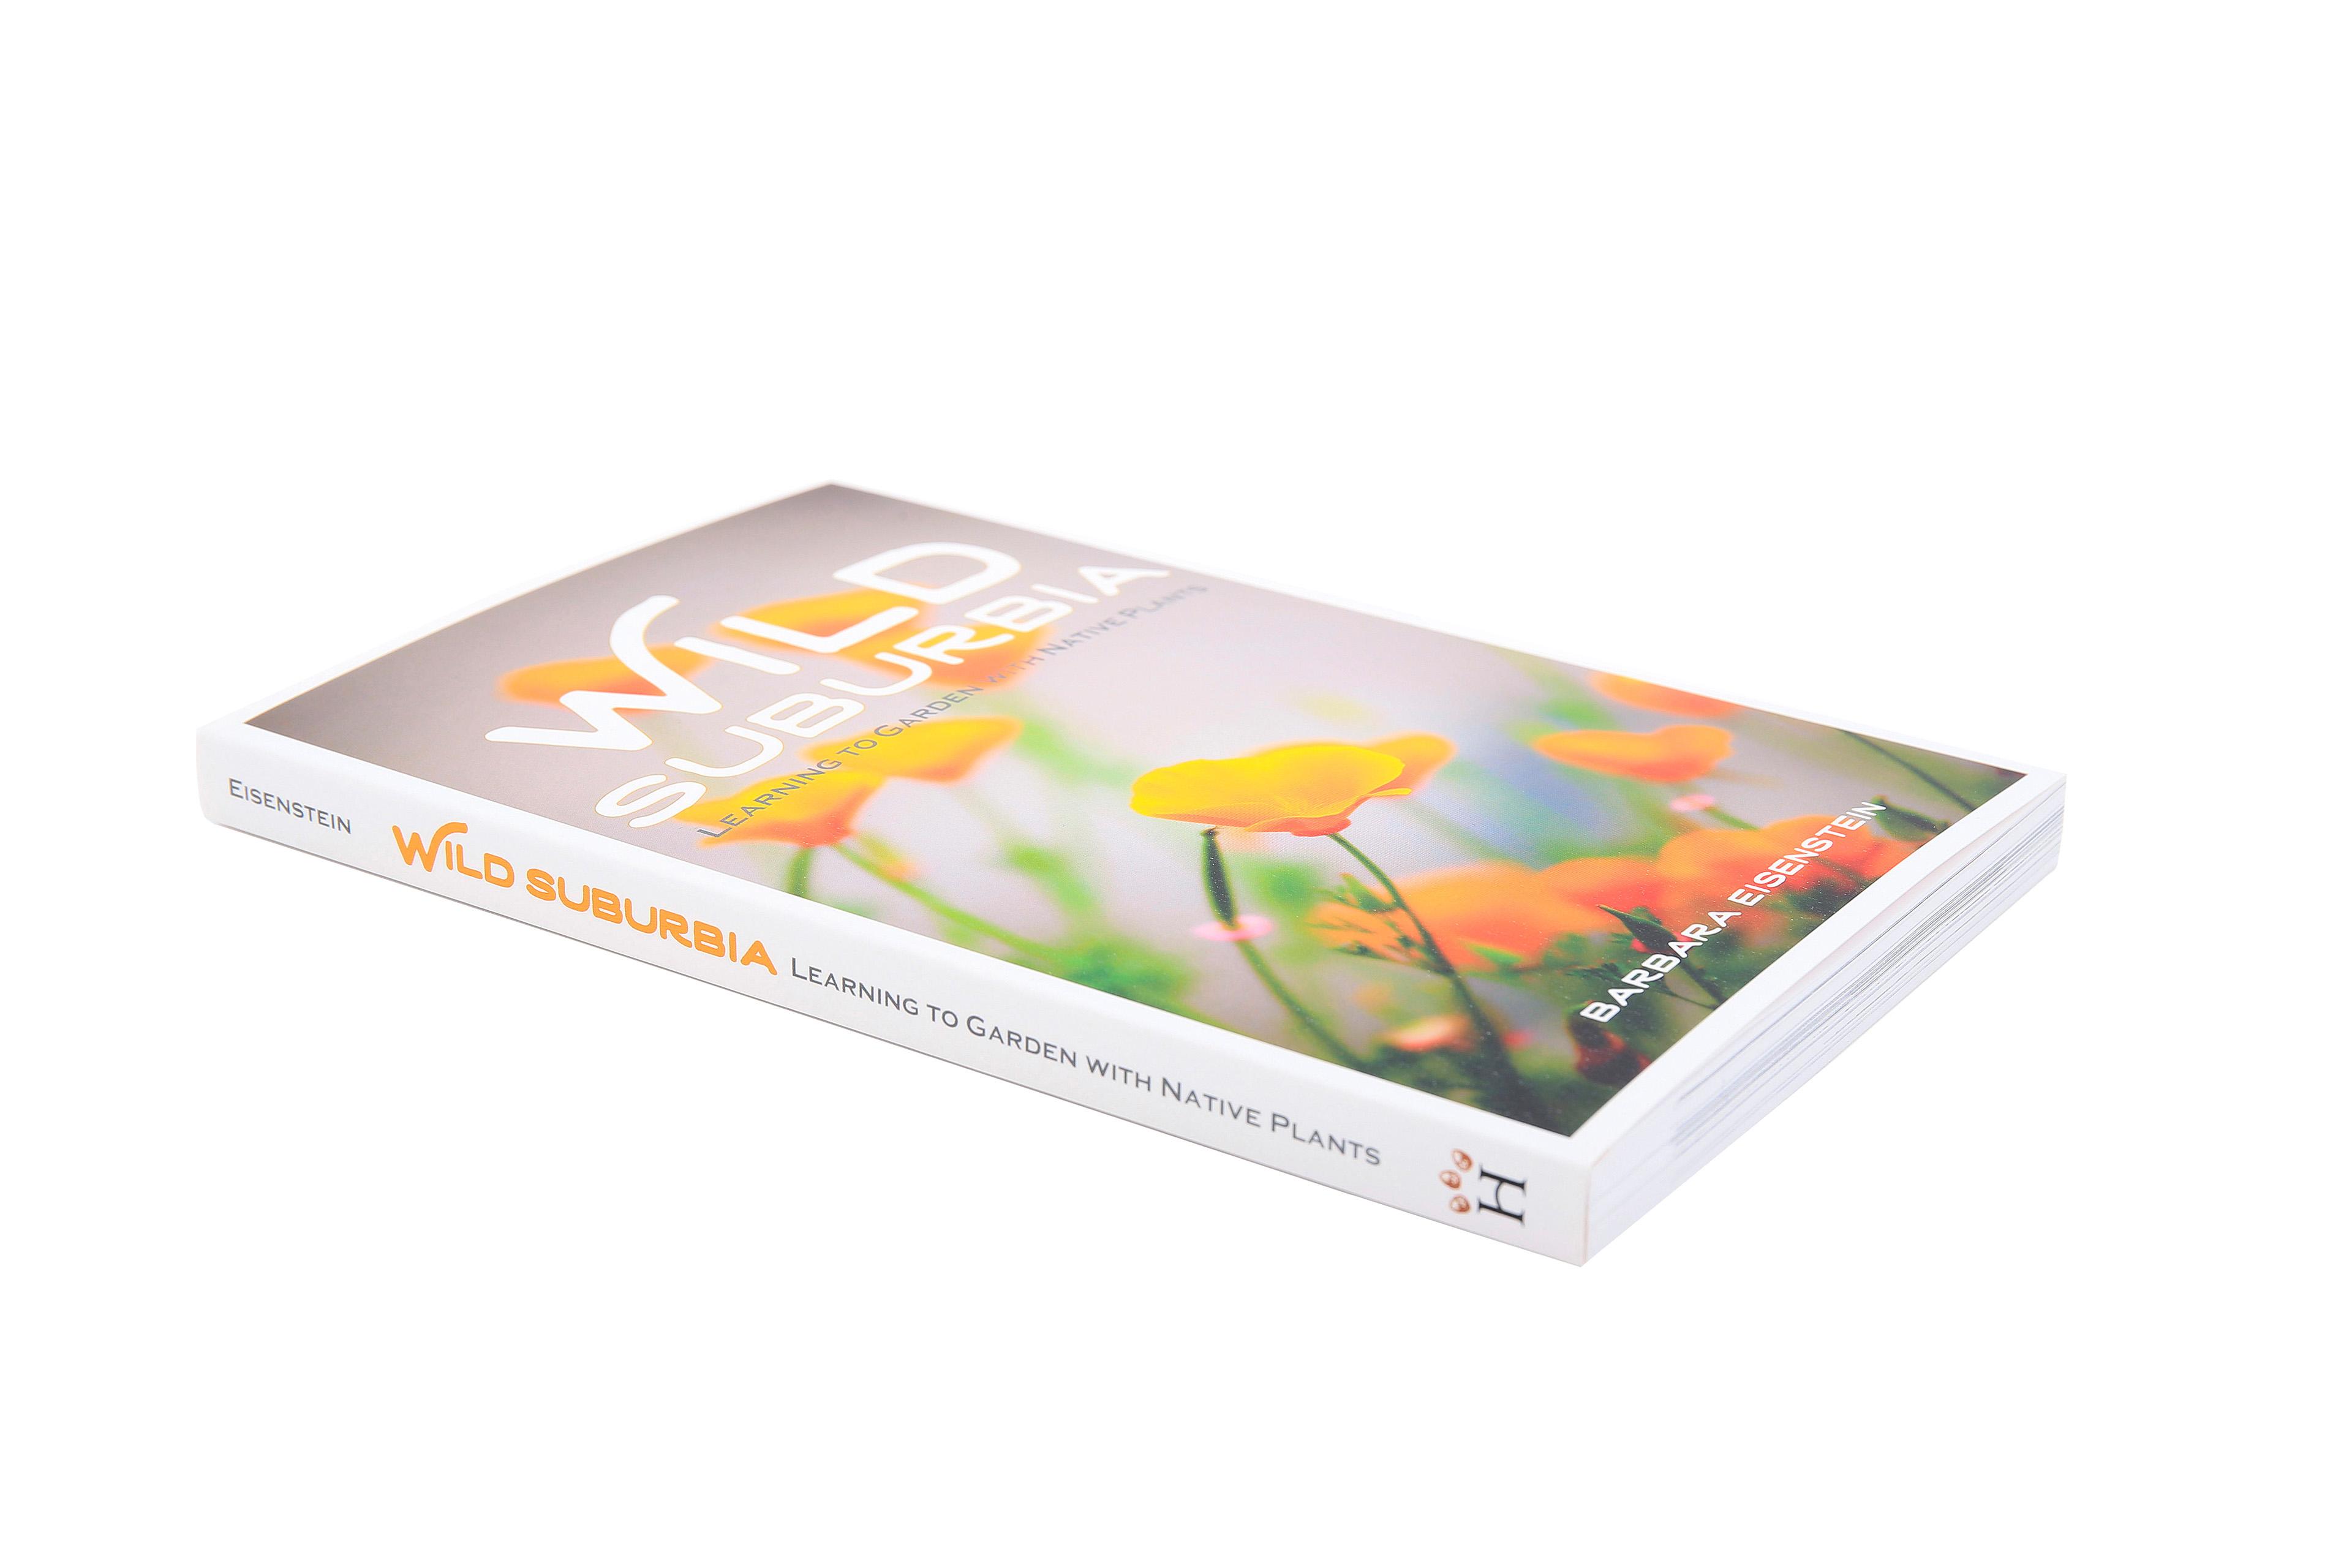 Ashley Ingram - Book Cover Design